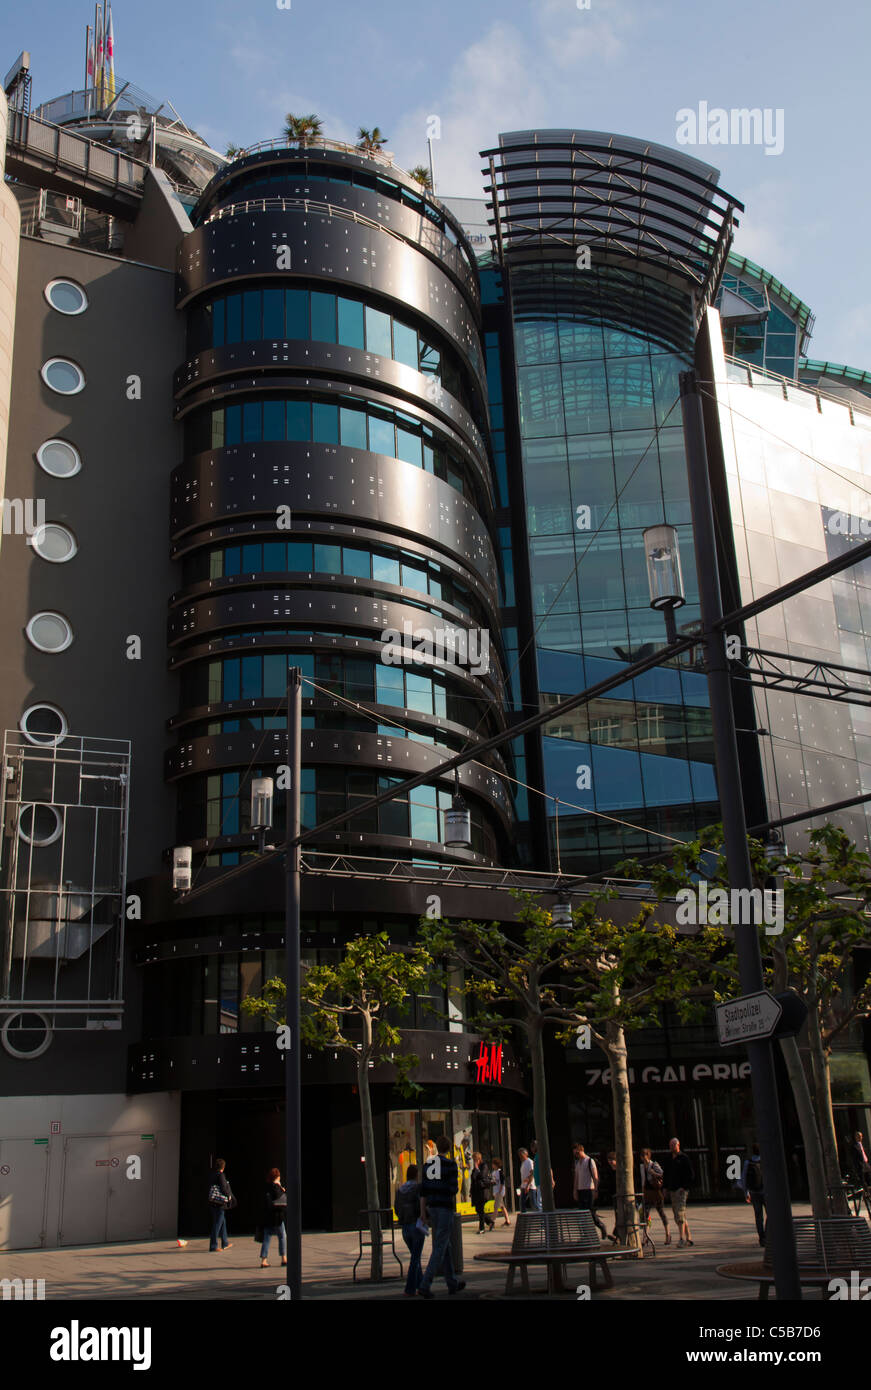 Frankfurt modern architecture shopping malls - Stock Image